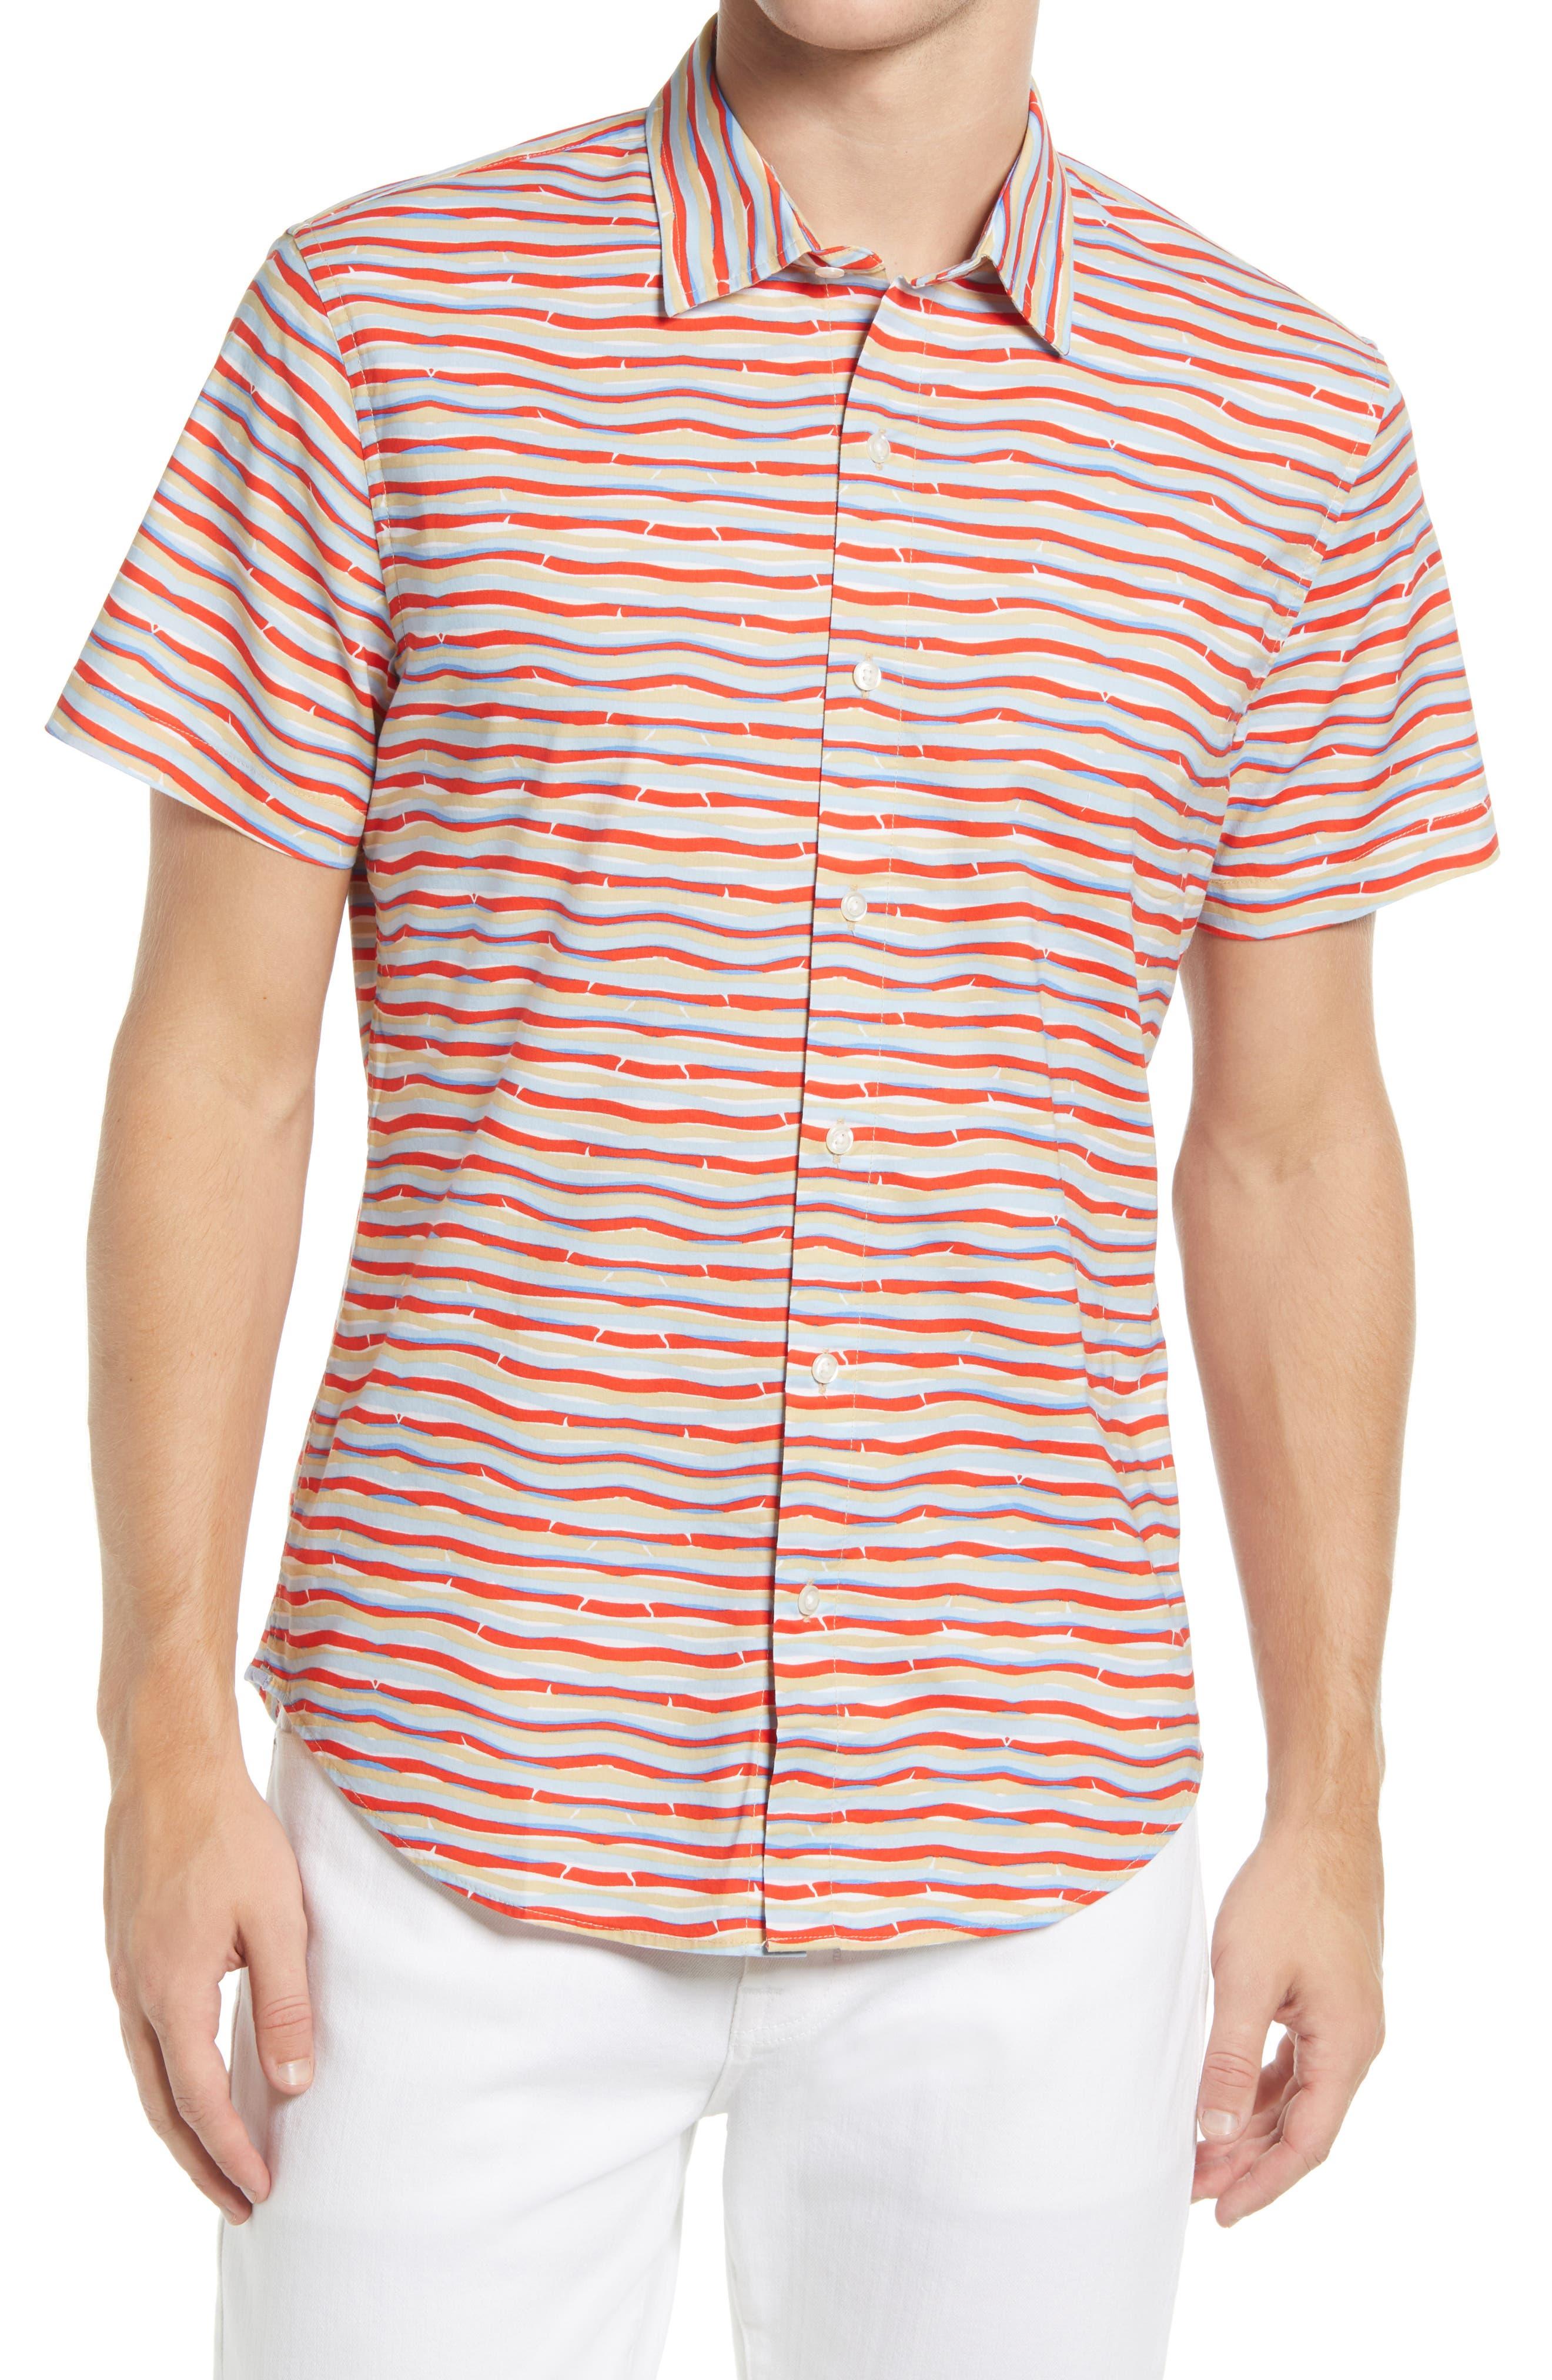 Riviera Slim Fit Stripe Short Sleeve Button-Up Shirt